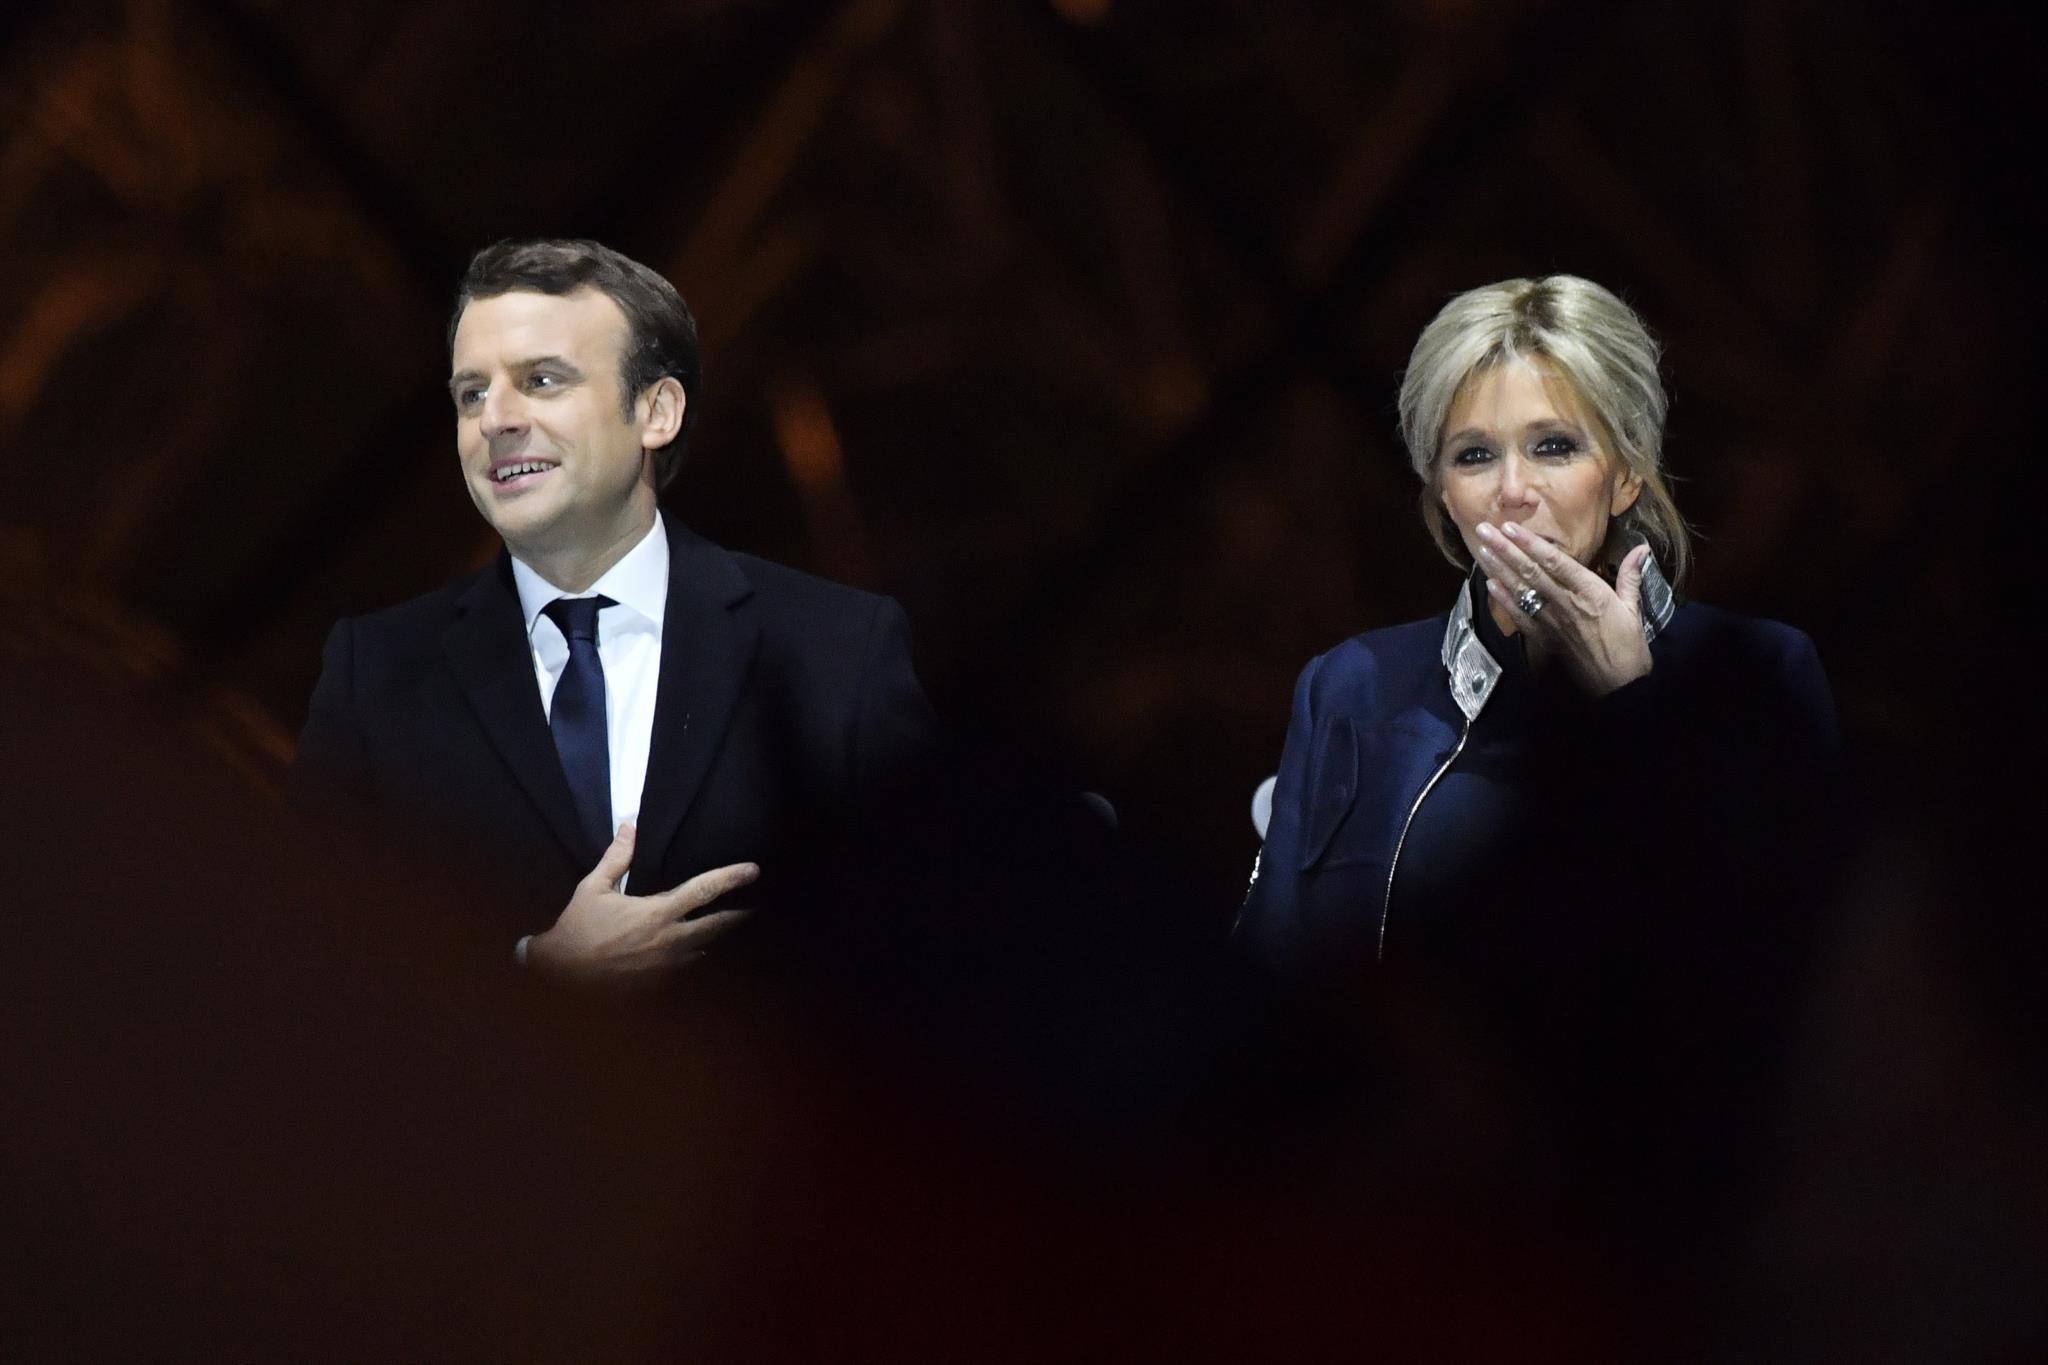 Porque é que diferença de idade de Macron e Trogneux é tema de conversa?